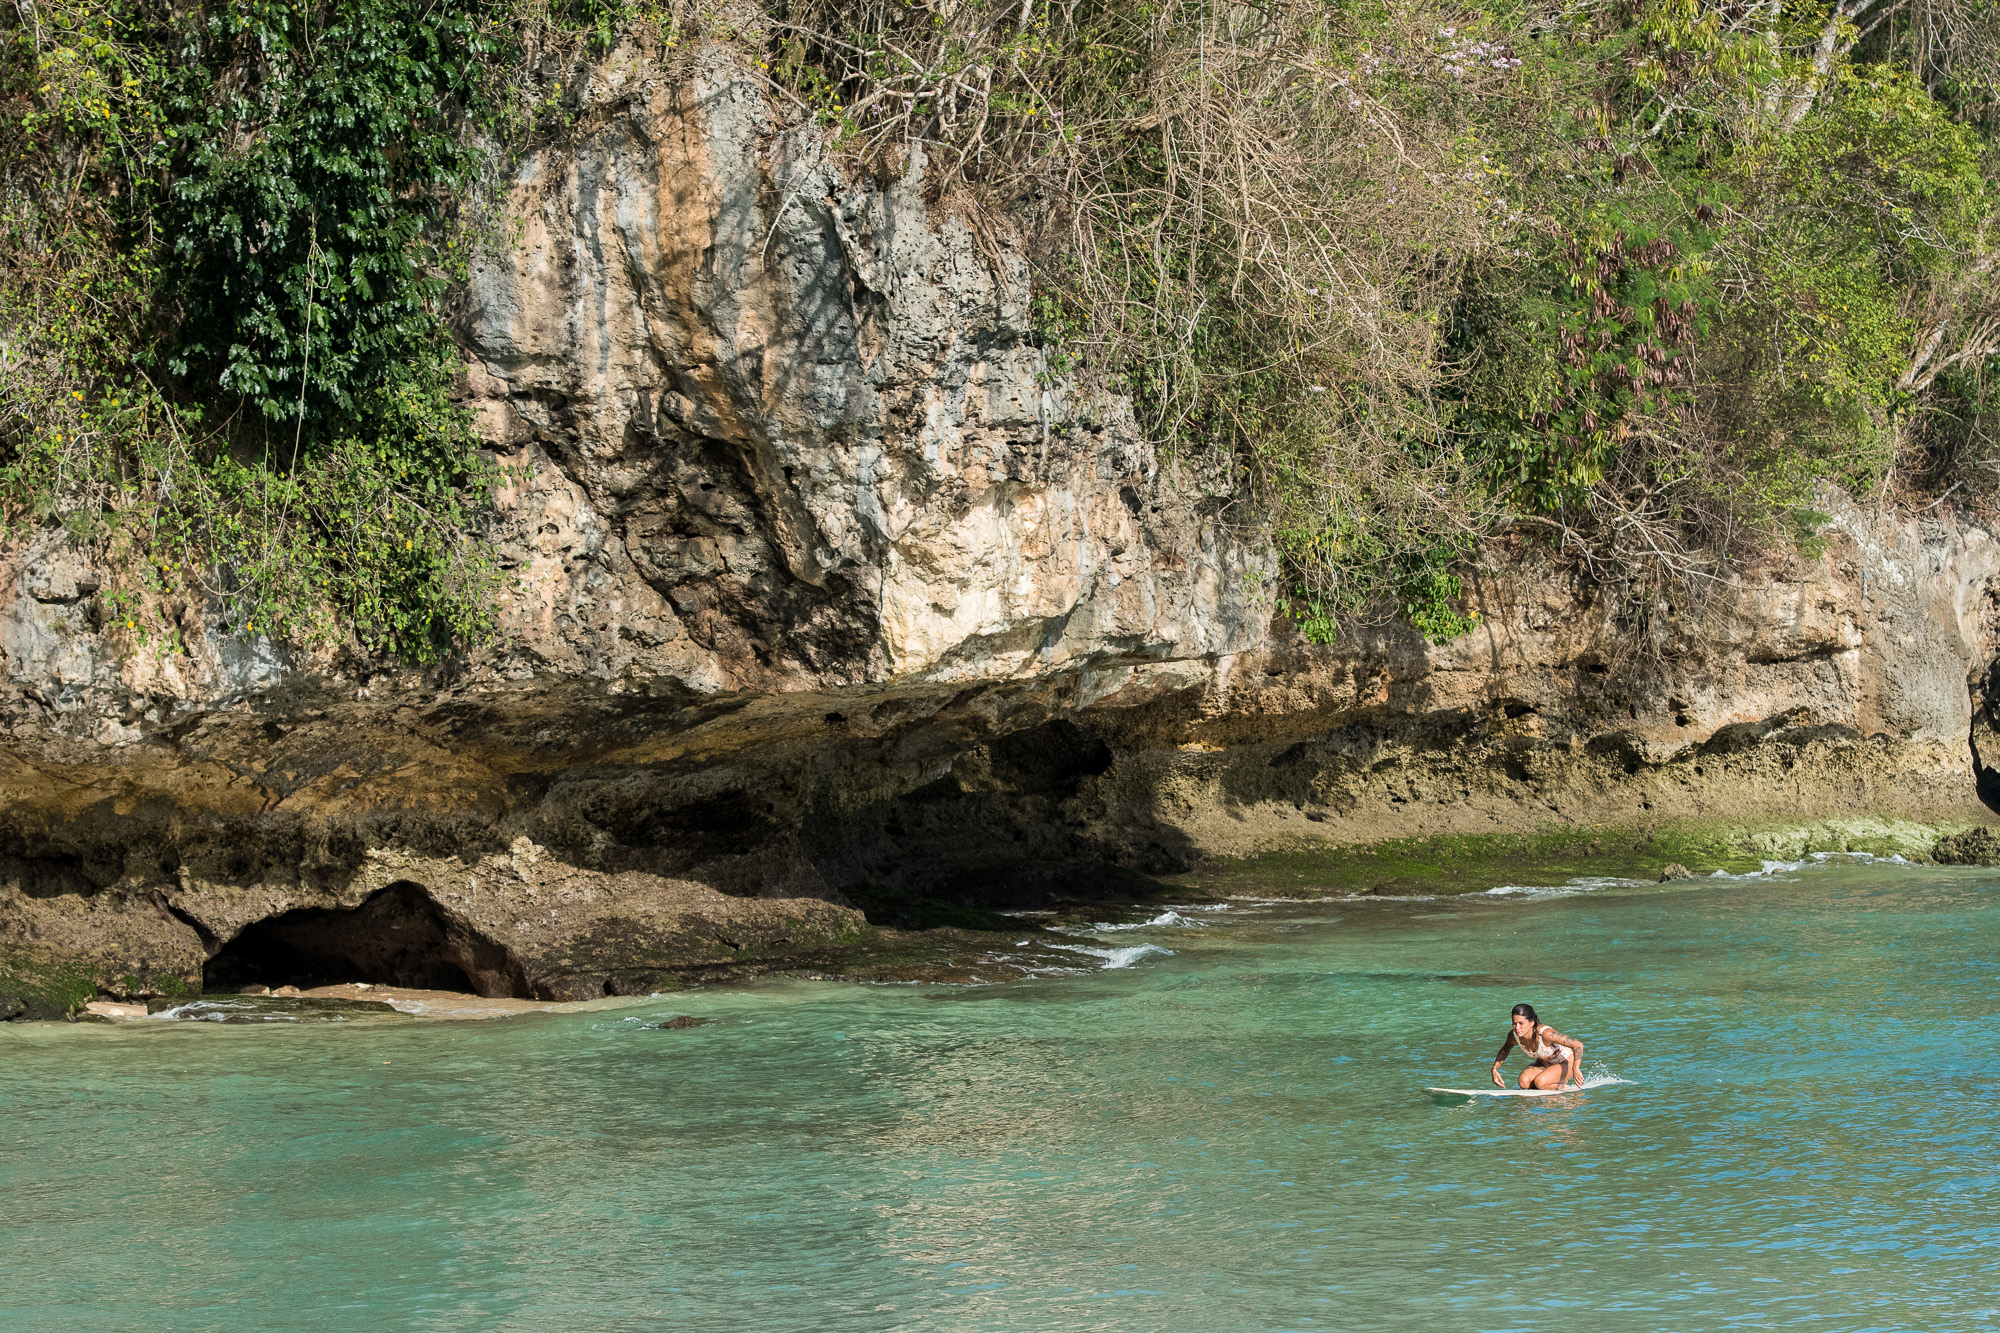 Padang Padang Paddle Paddle